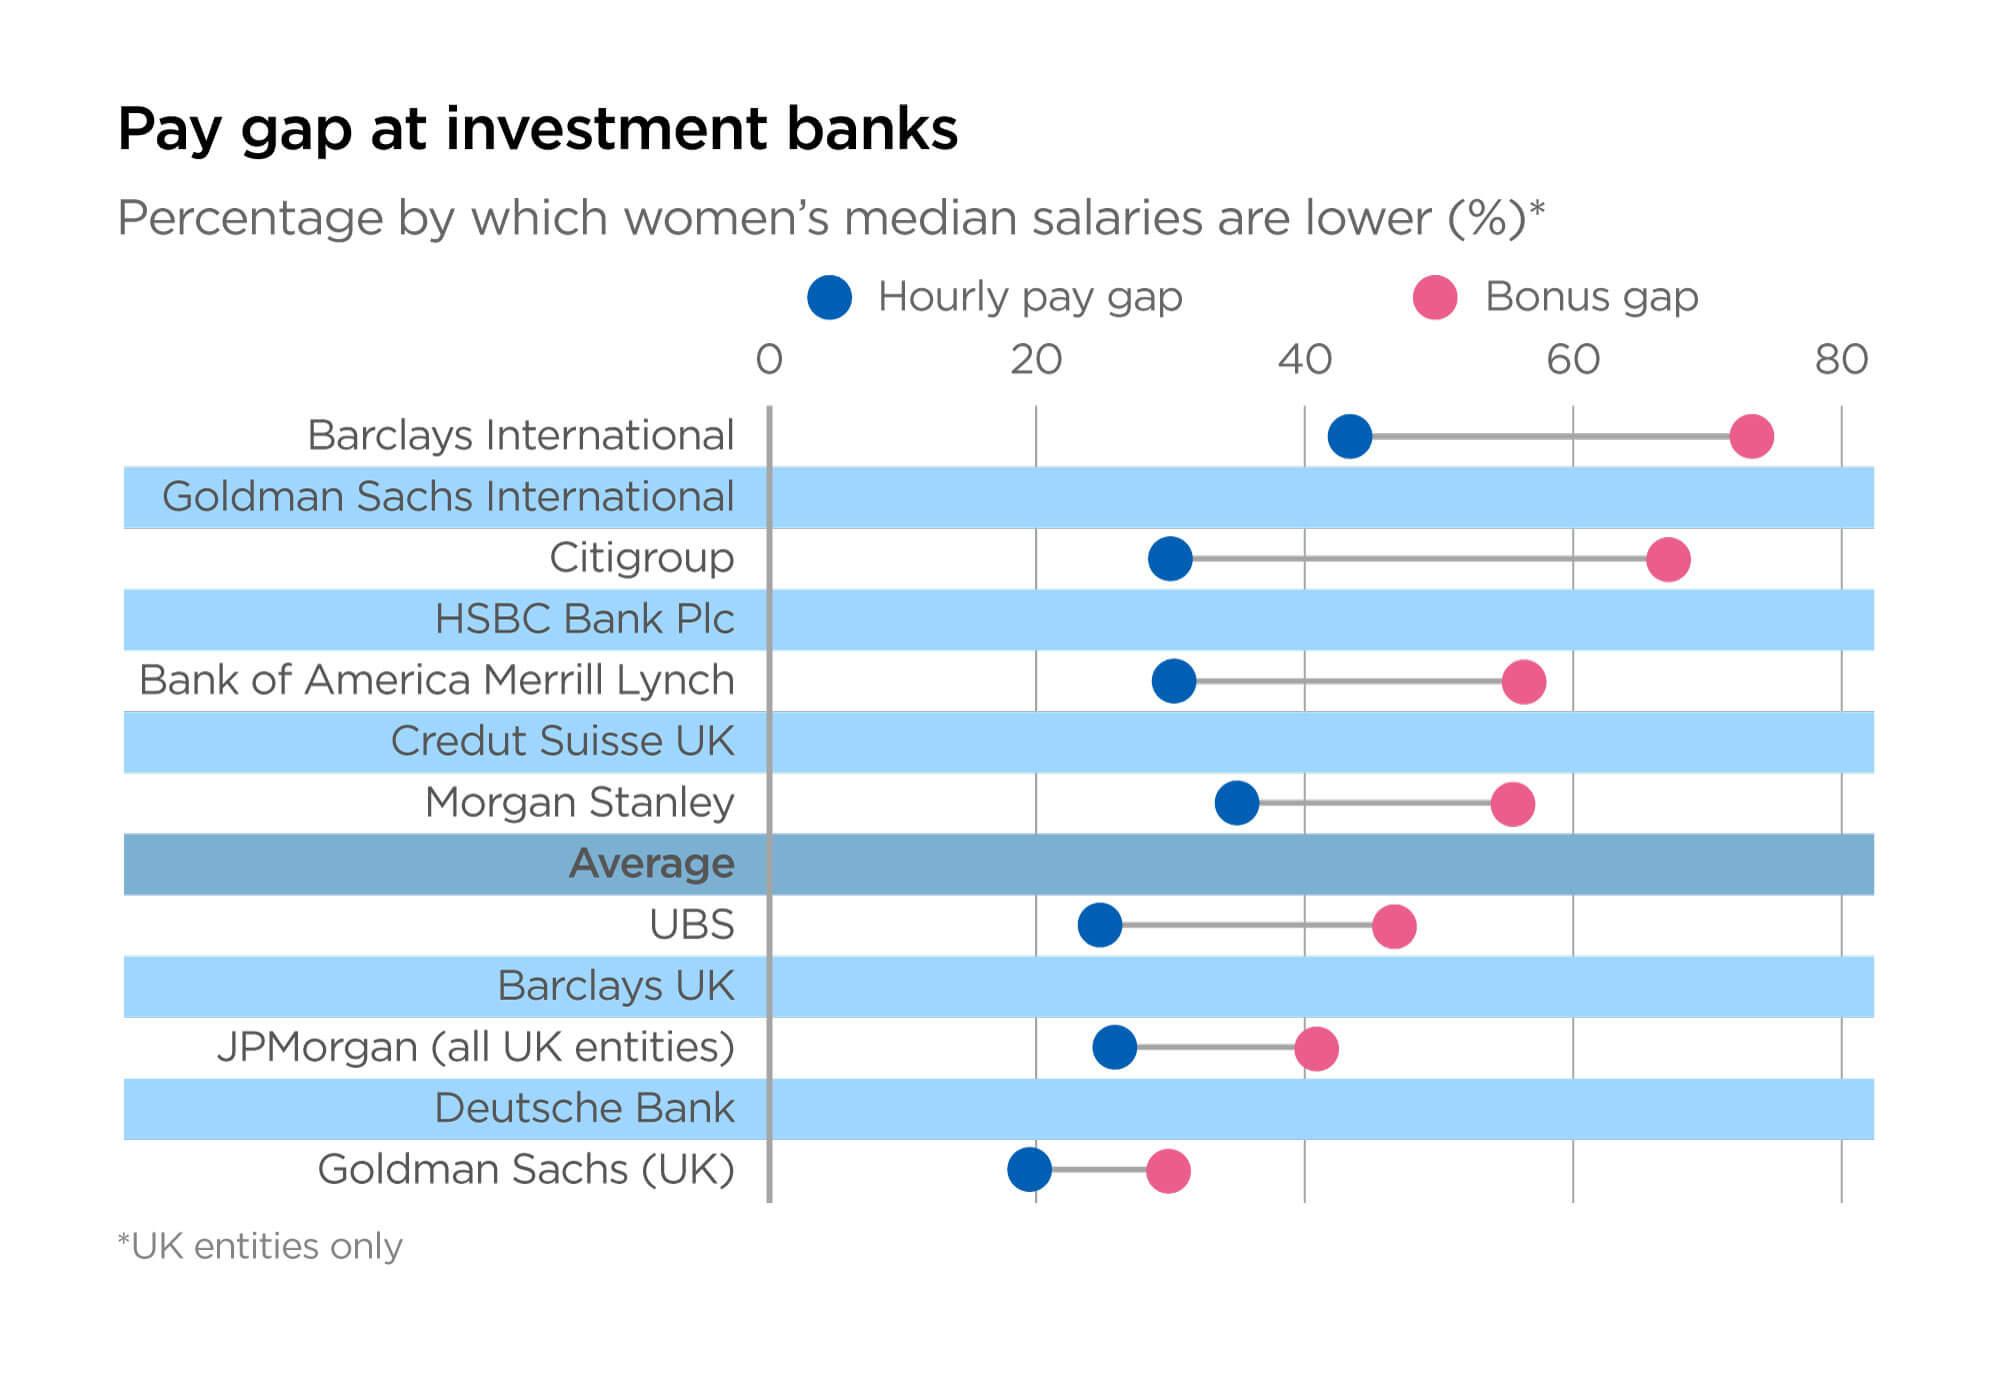 Pay gap at investment banks